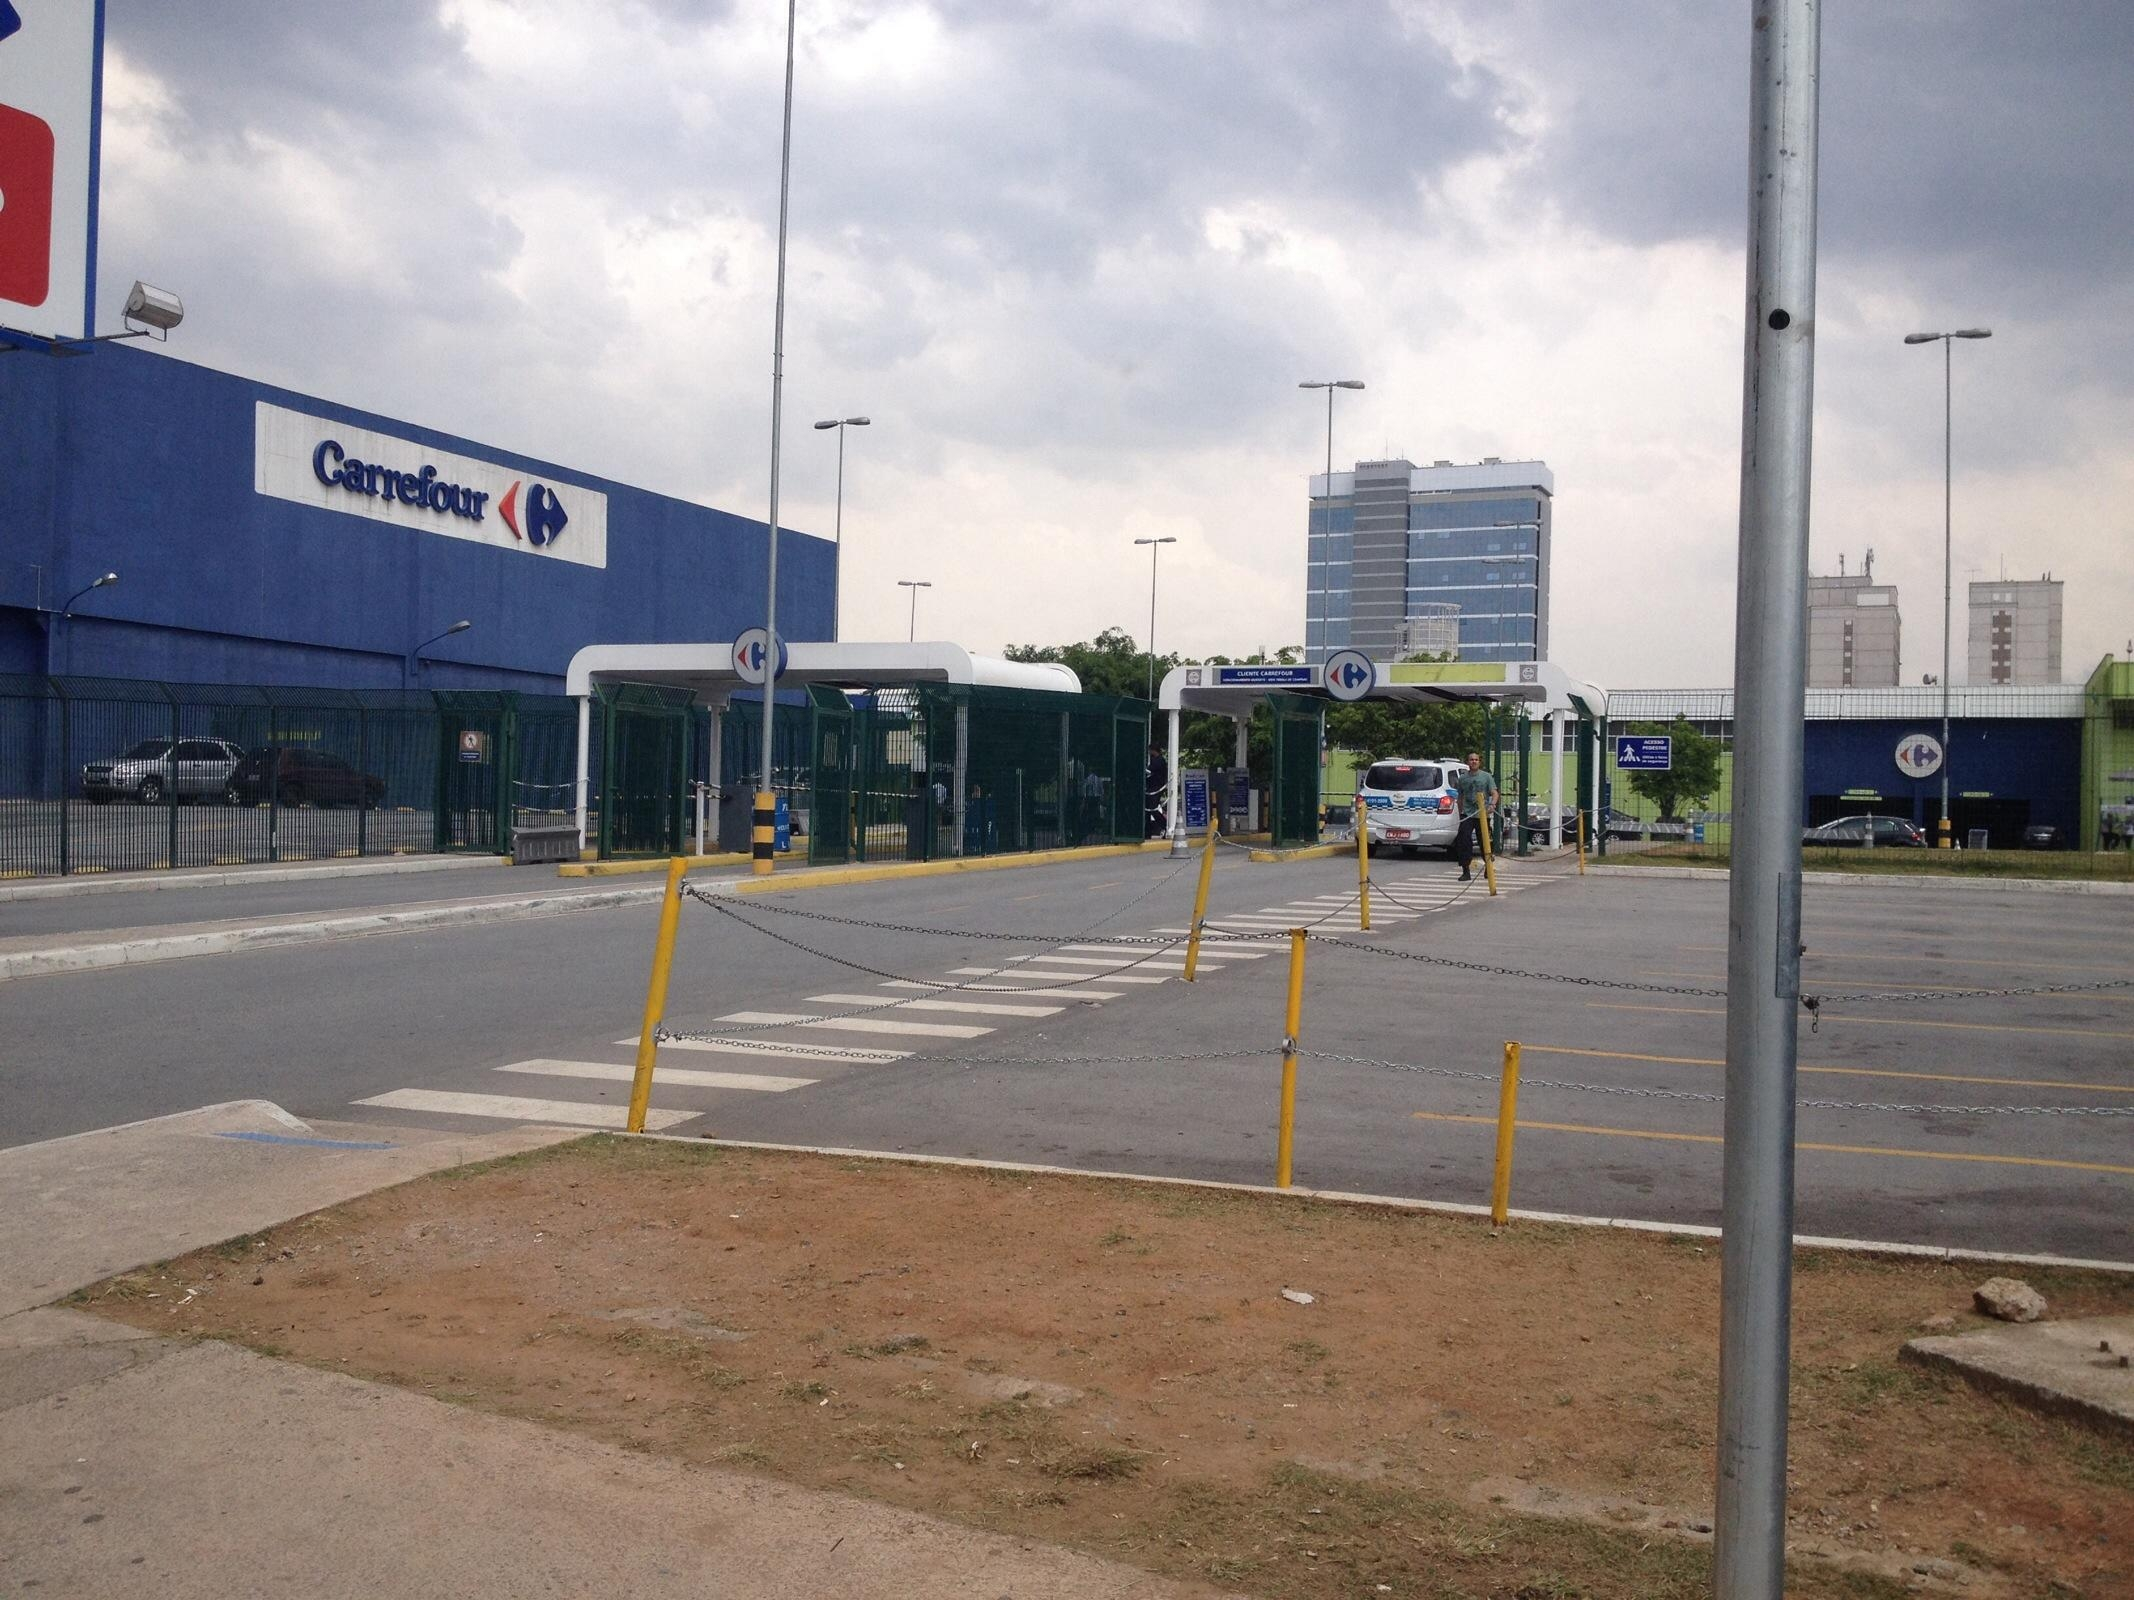 Brasilpark carrefour tambor parking in barueri parkme for Protector parking carrefour